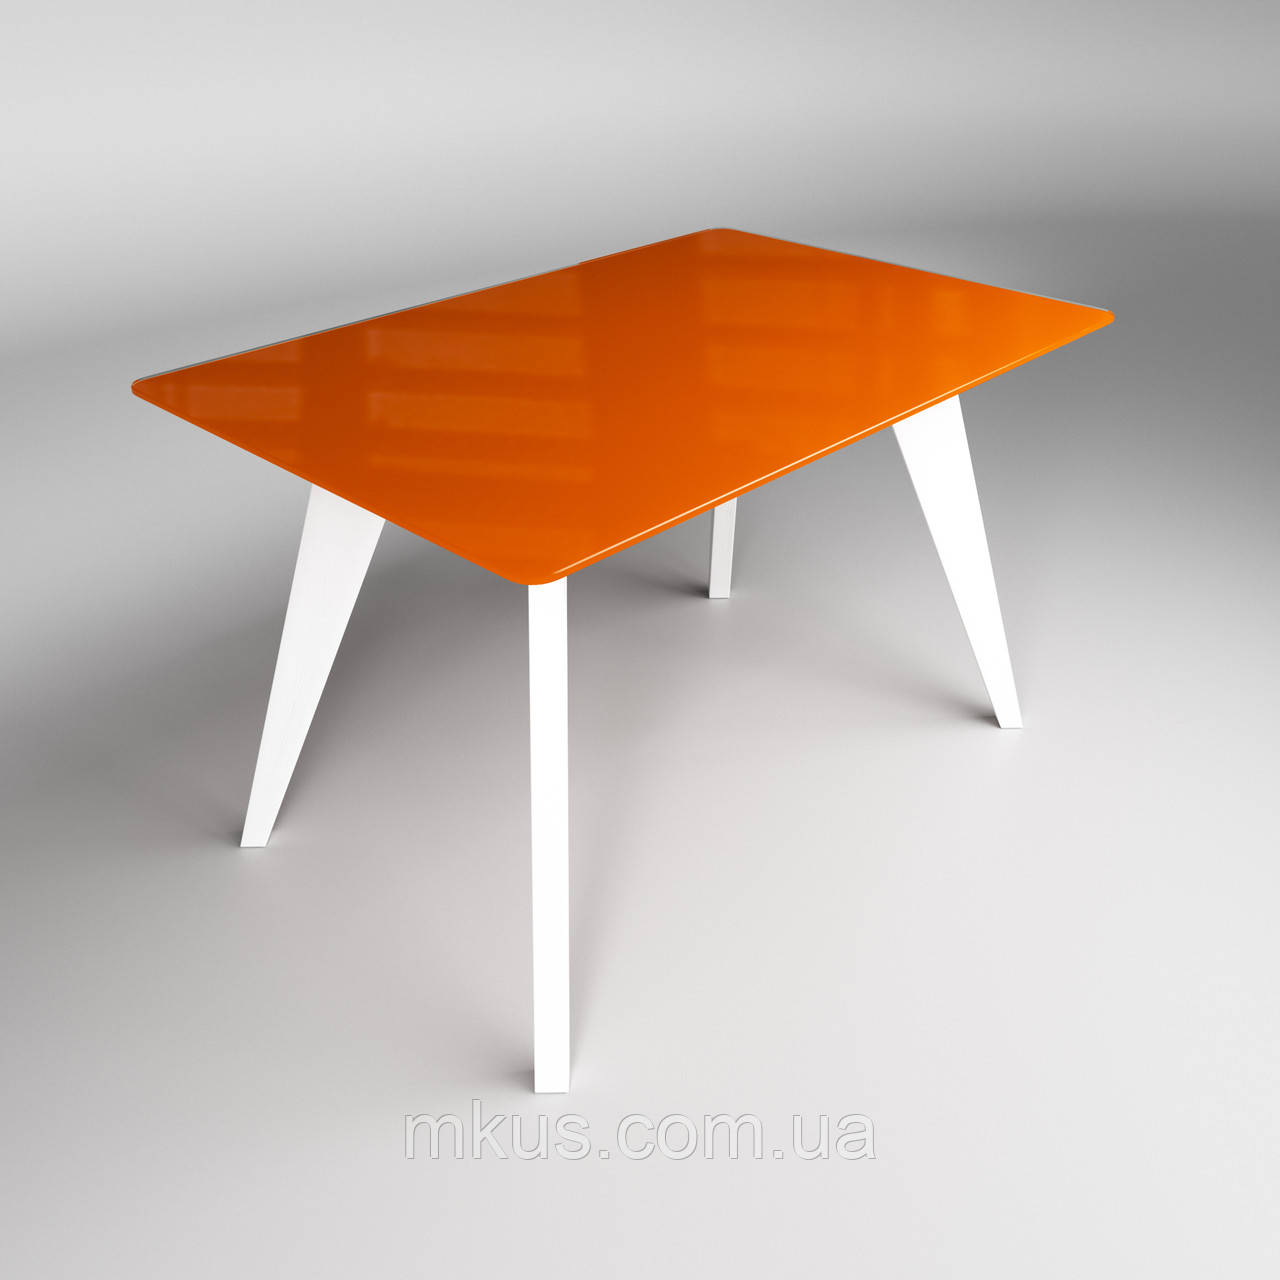 Стол Леонардо оранжево-белый